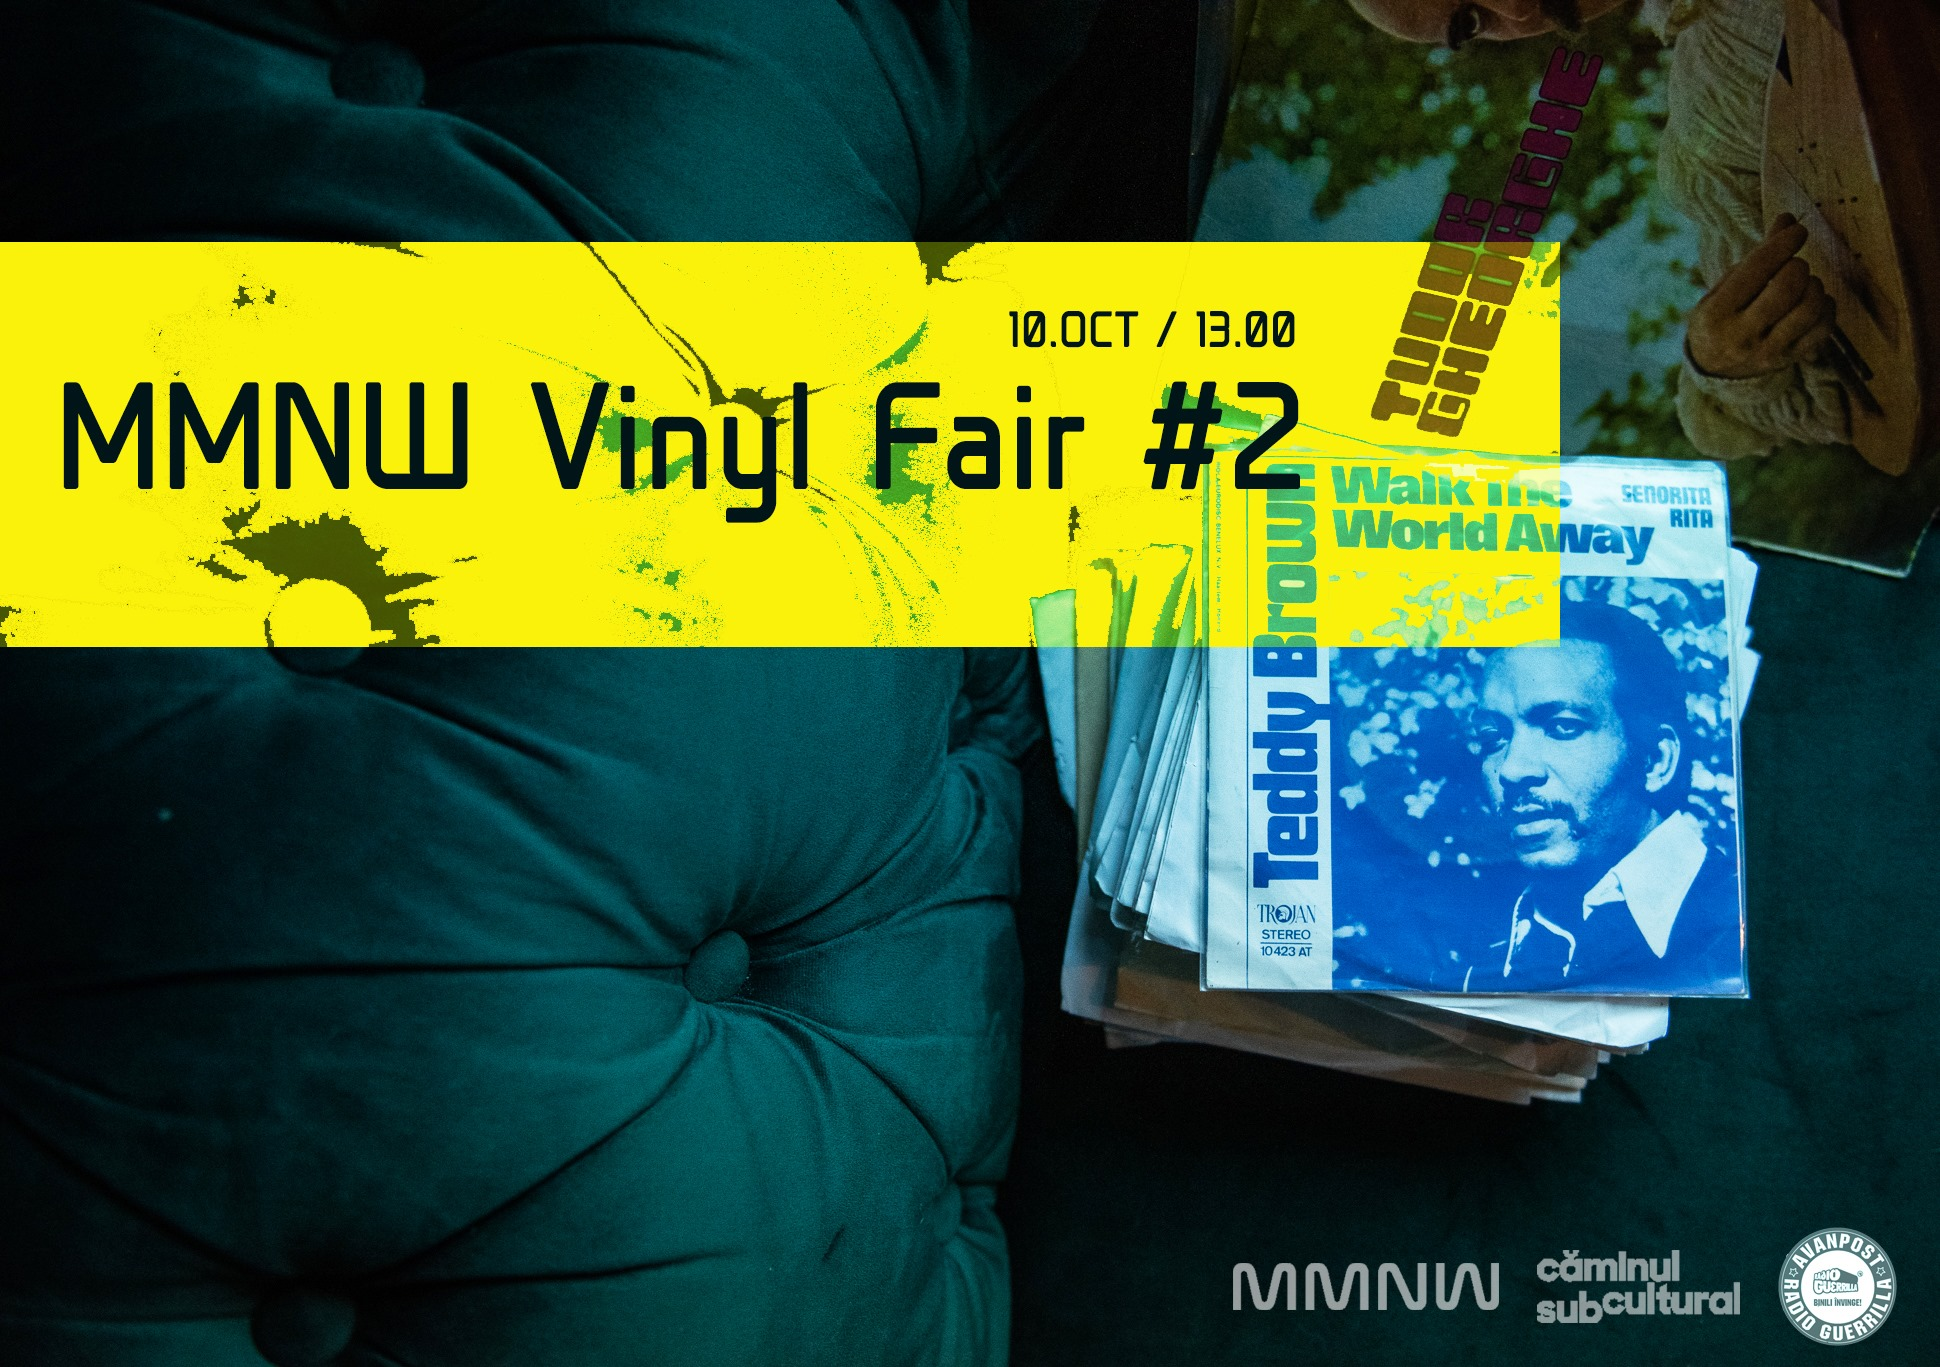 MMNW Vinyl Fair #2